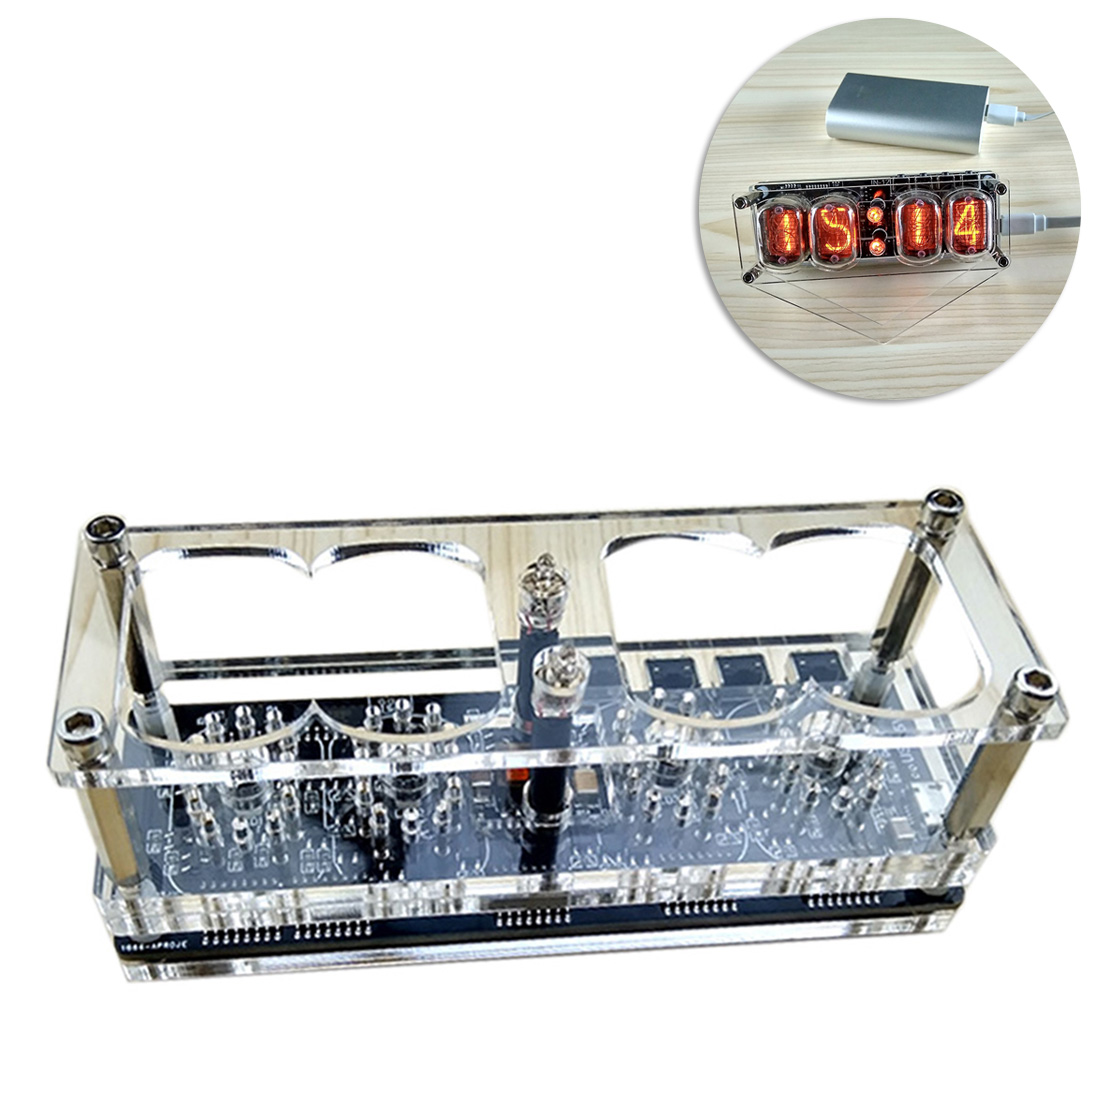 DIY Glow Tube Clock Base Four Digital Glow Tube Clock For Glow Tube (No Glow Tube ) -Basic /Advanced Version